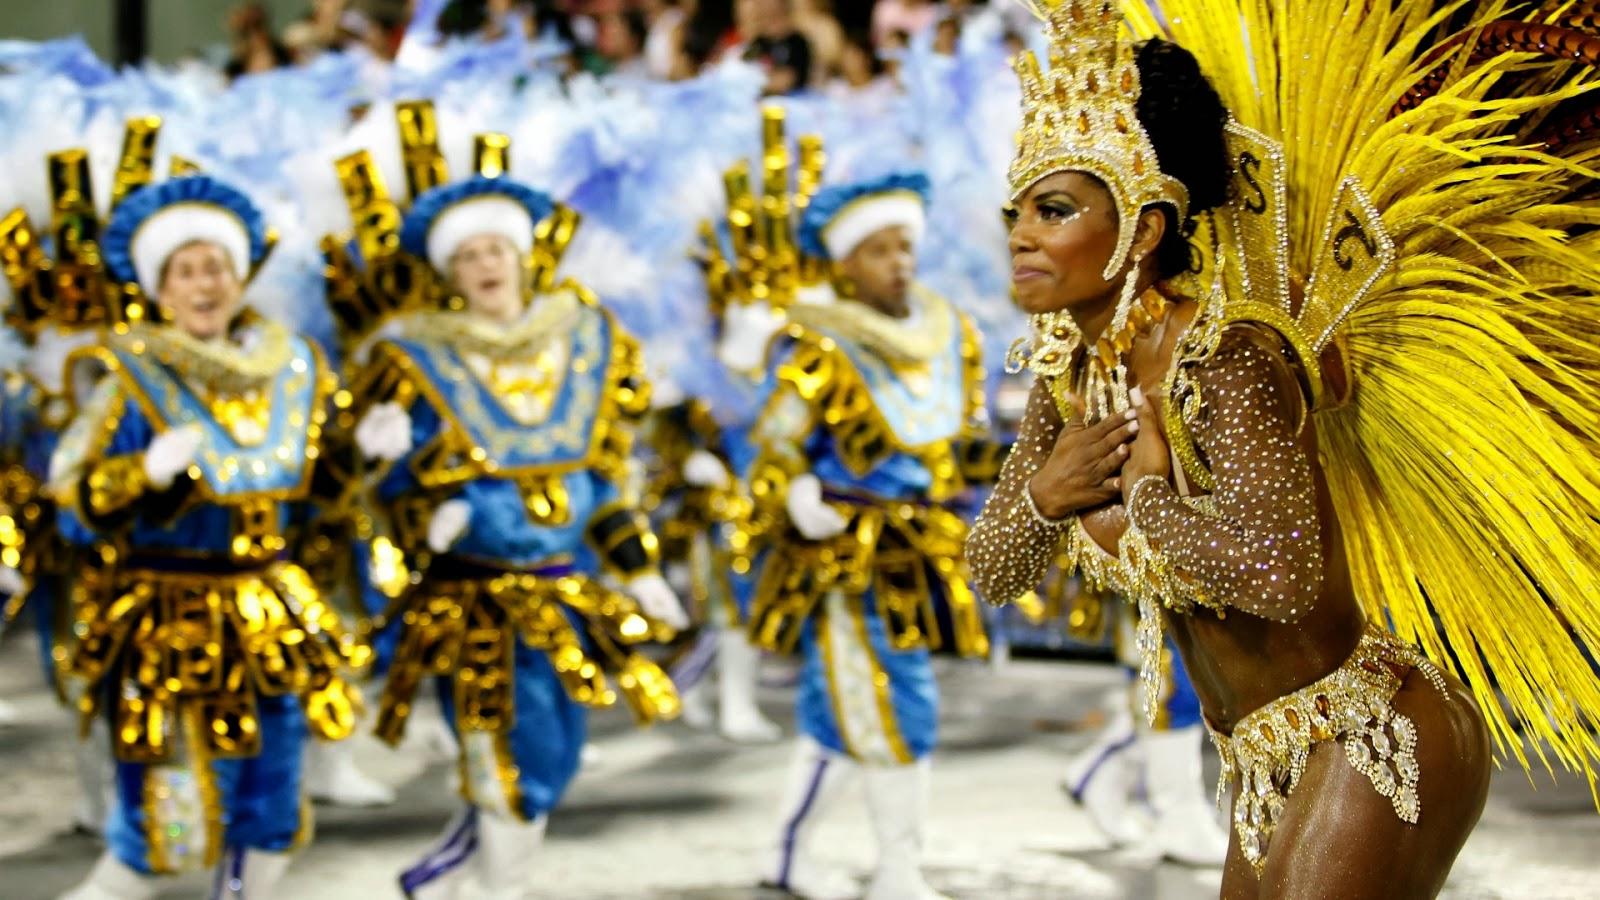 Carnaval de salvador 1 - 2 part 7